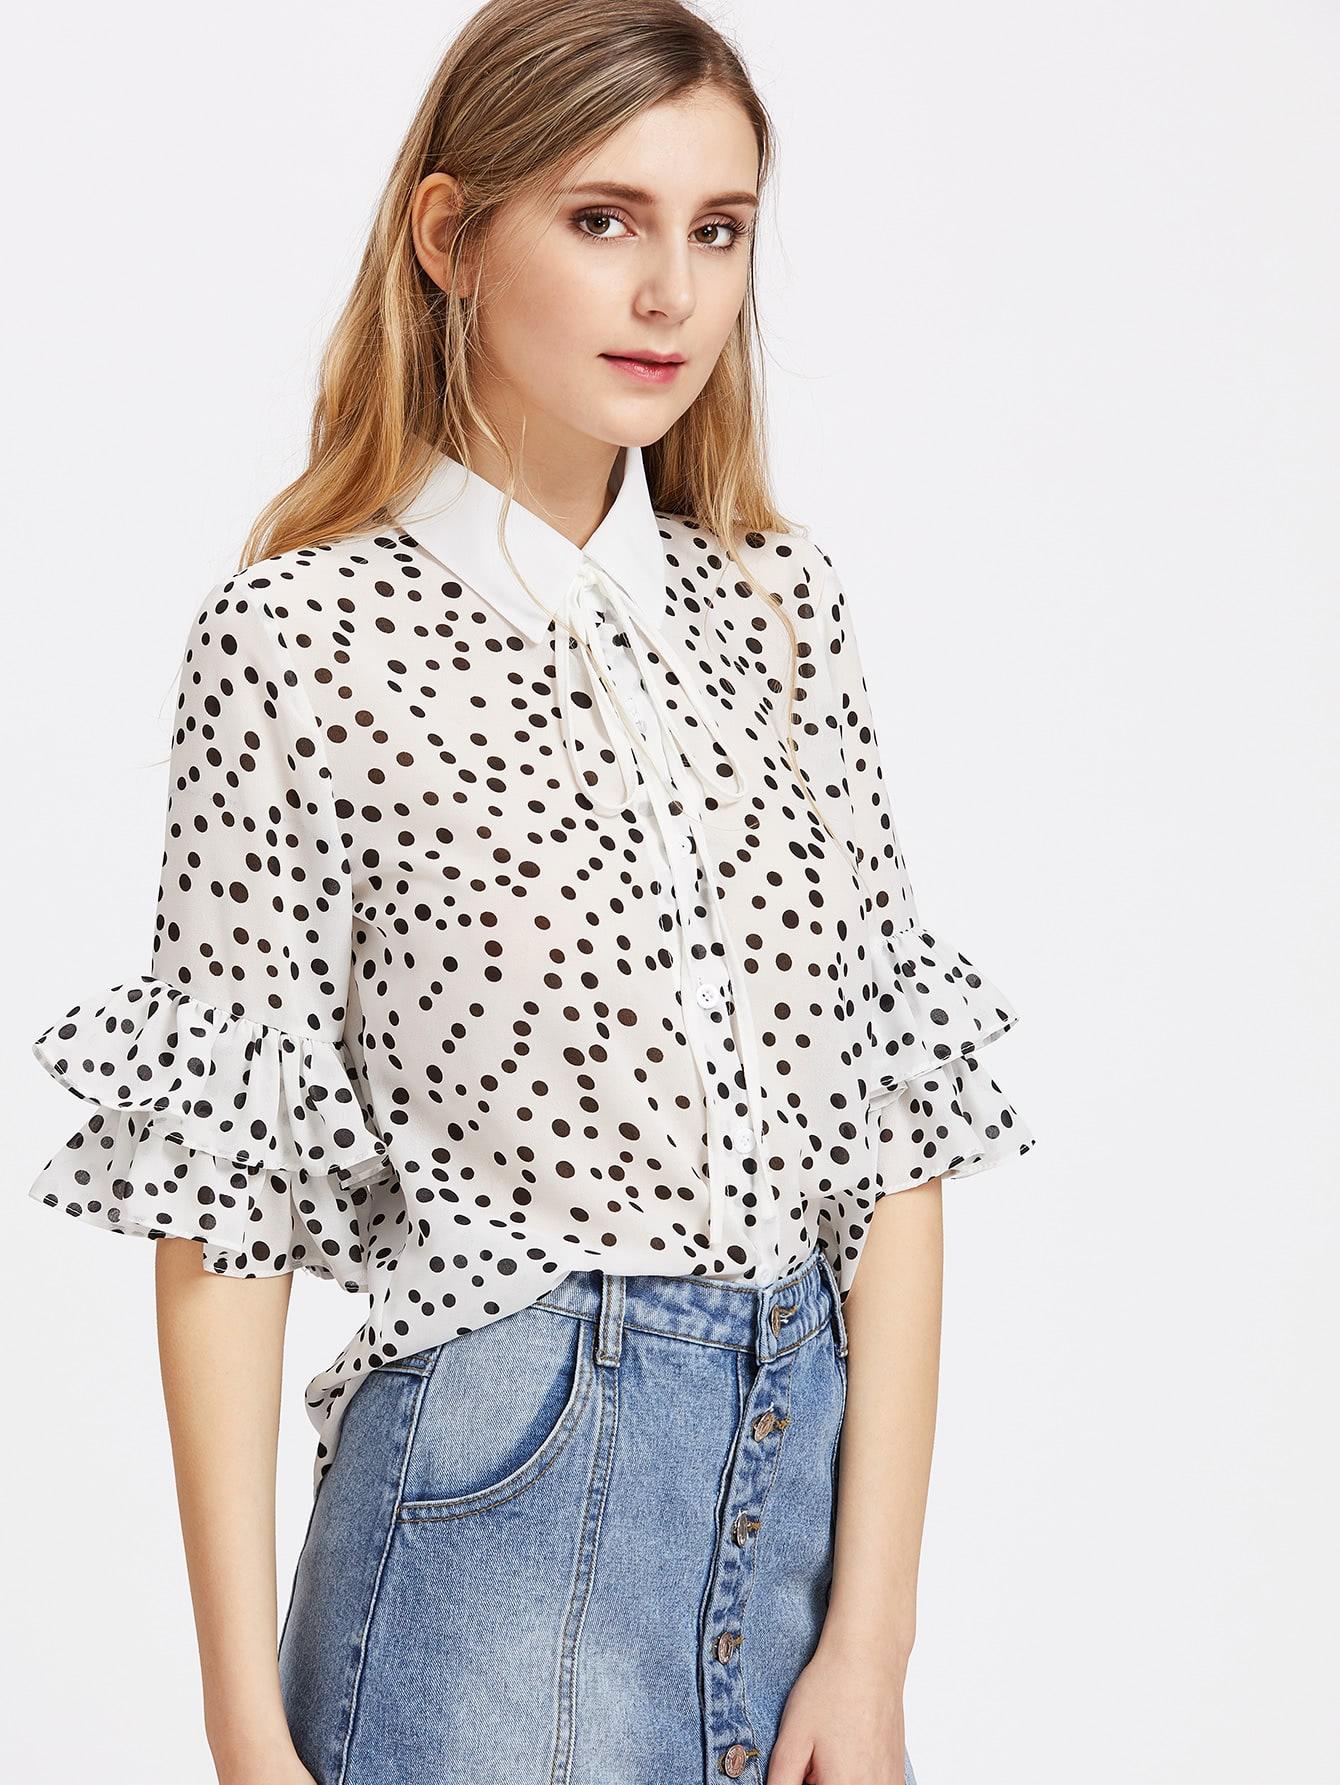 blouse170405452_2